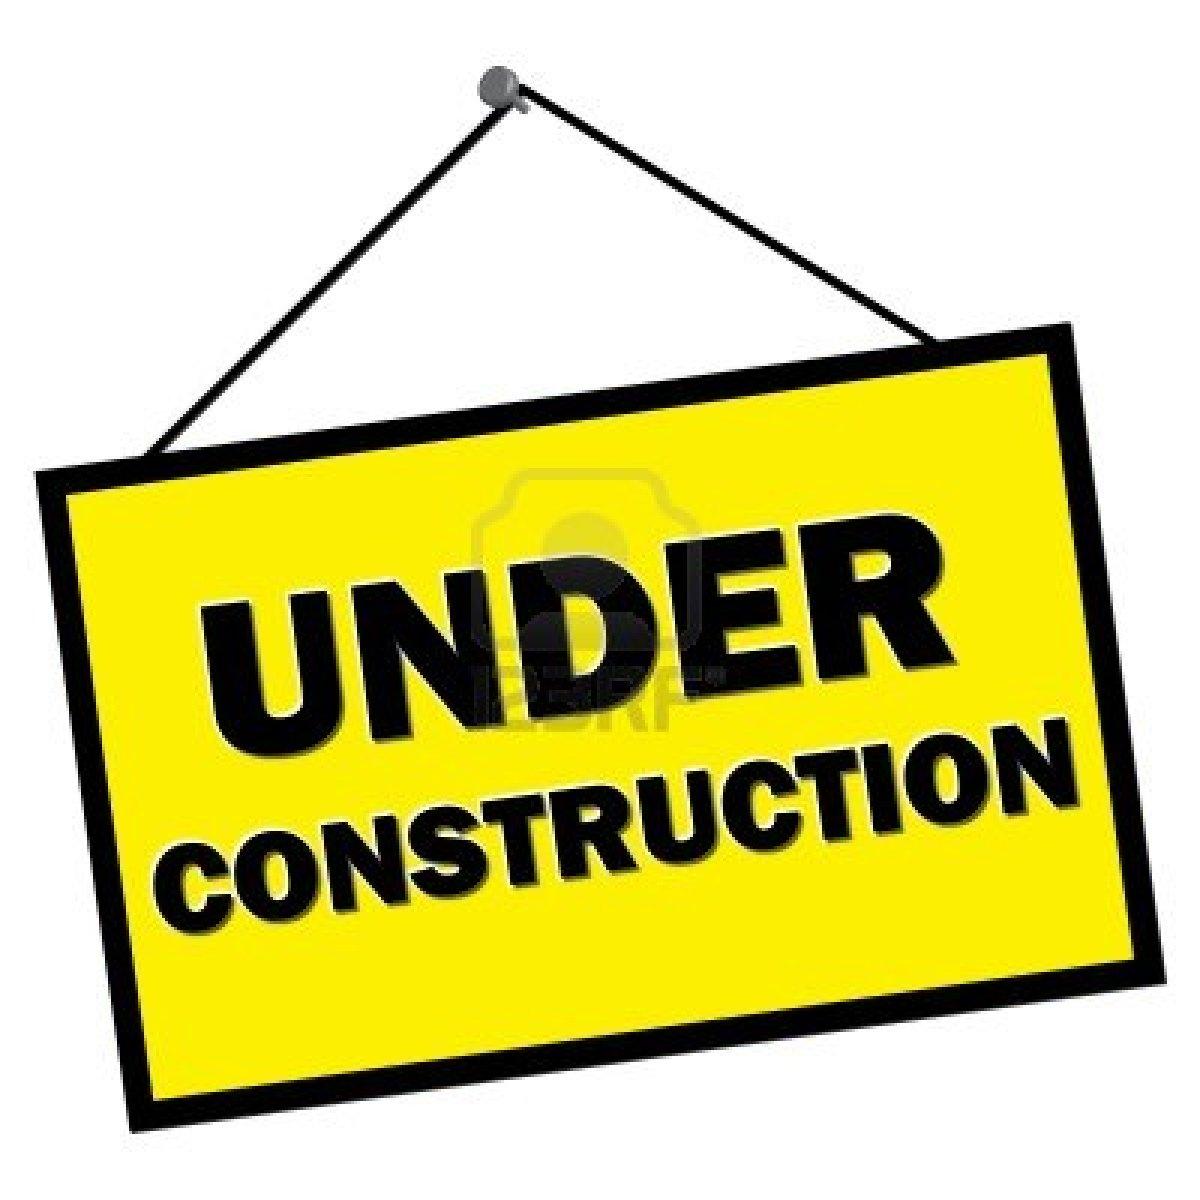 1200x1200 Under Construction